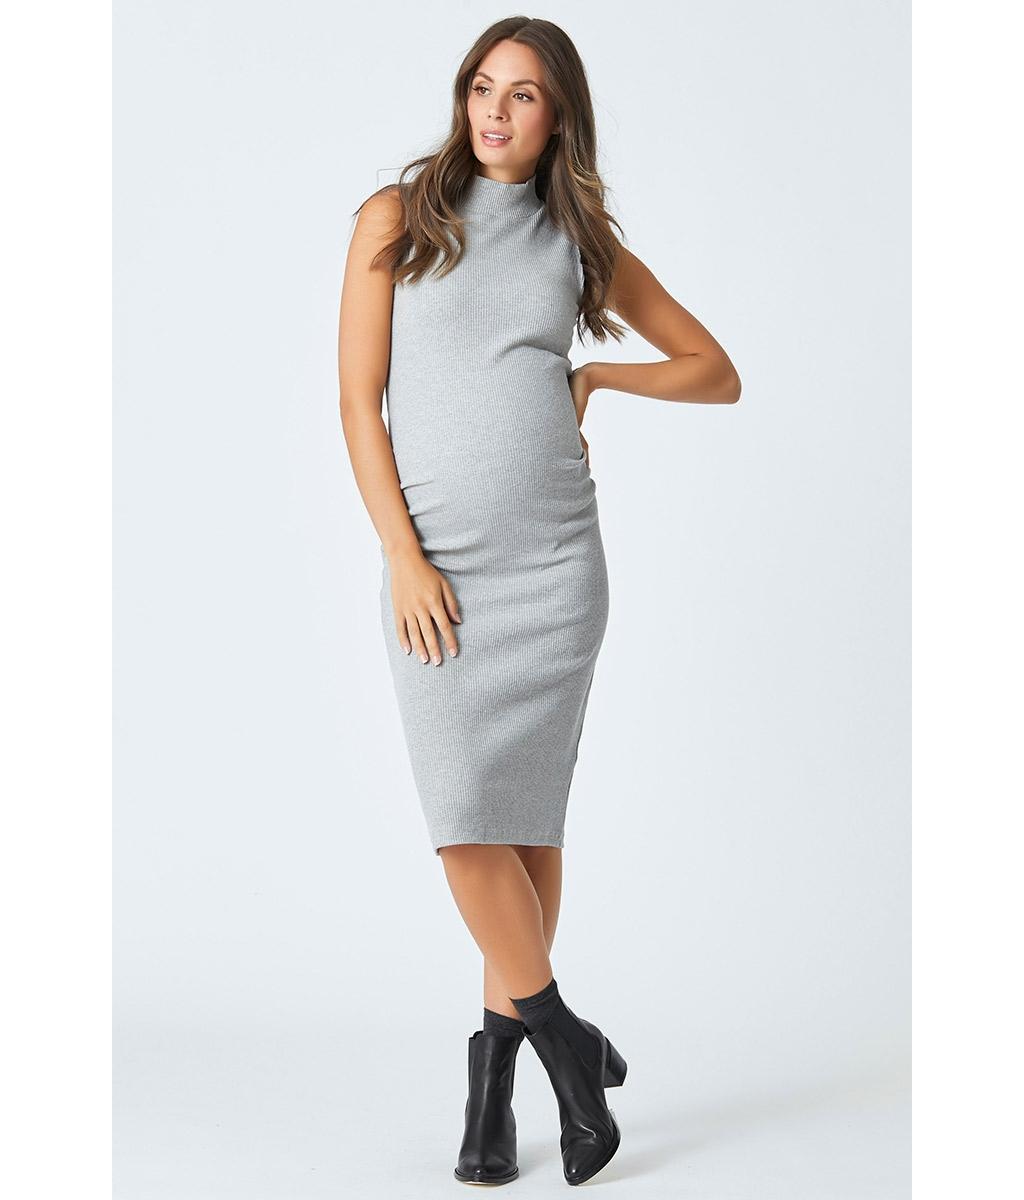 Audrey maternity rib dress 3 bears stylish grey cotton stretch rib maternity bodycon dress ombrellifo Choice Image